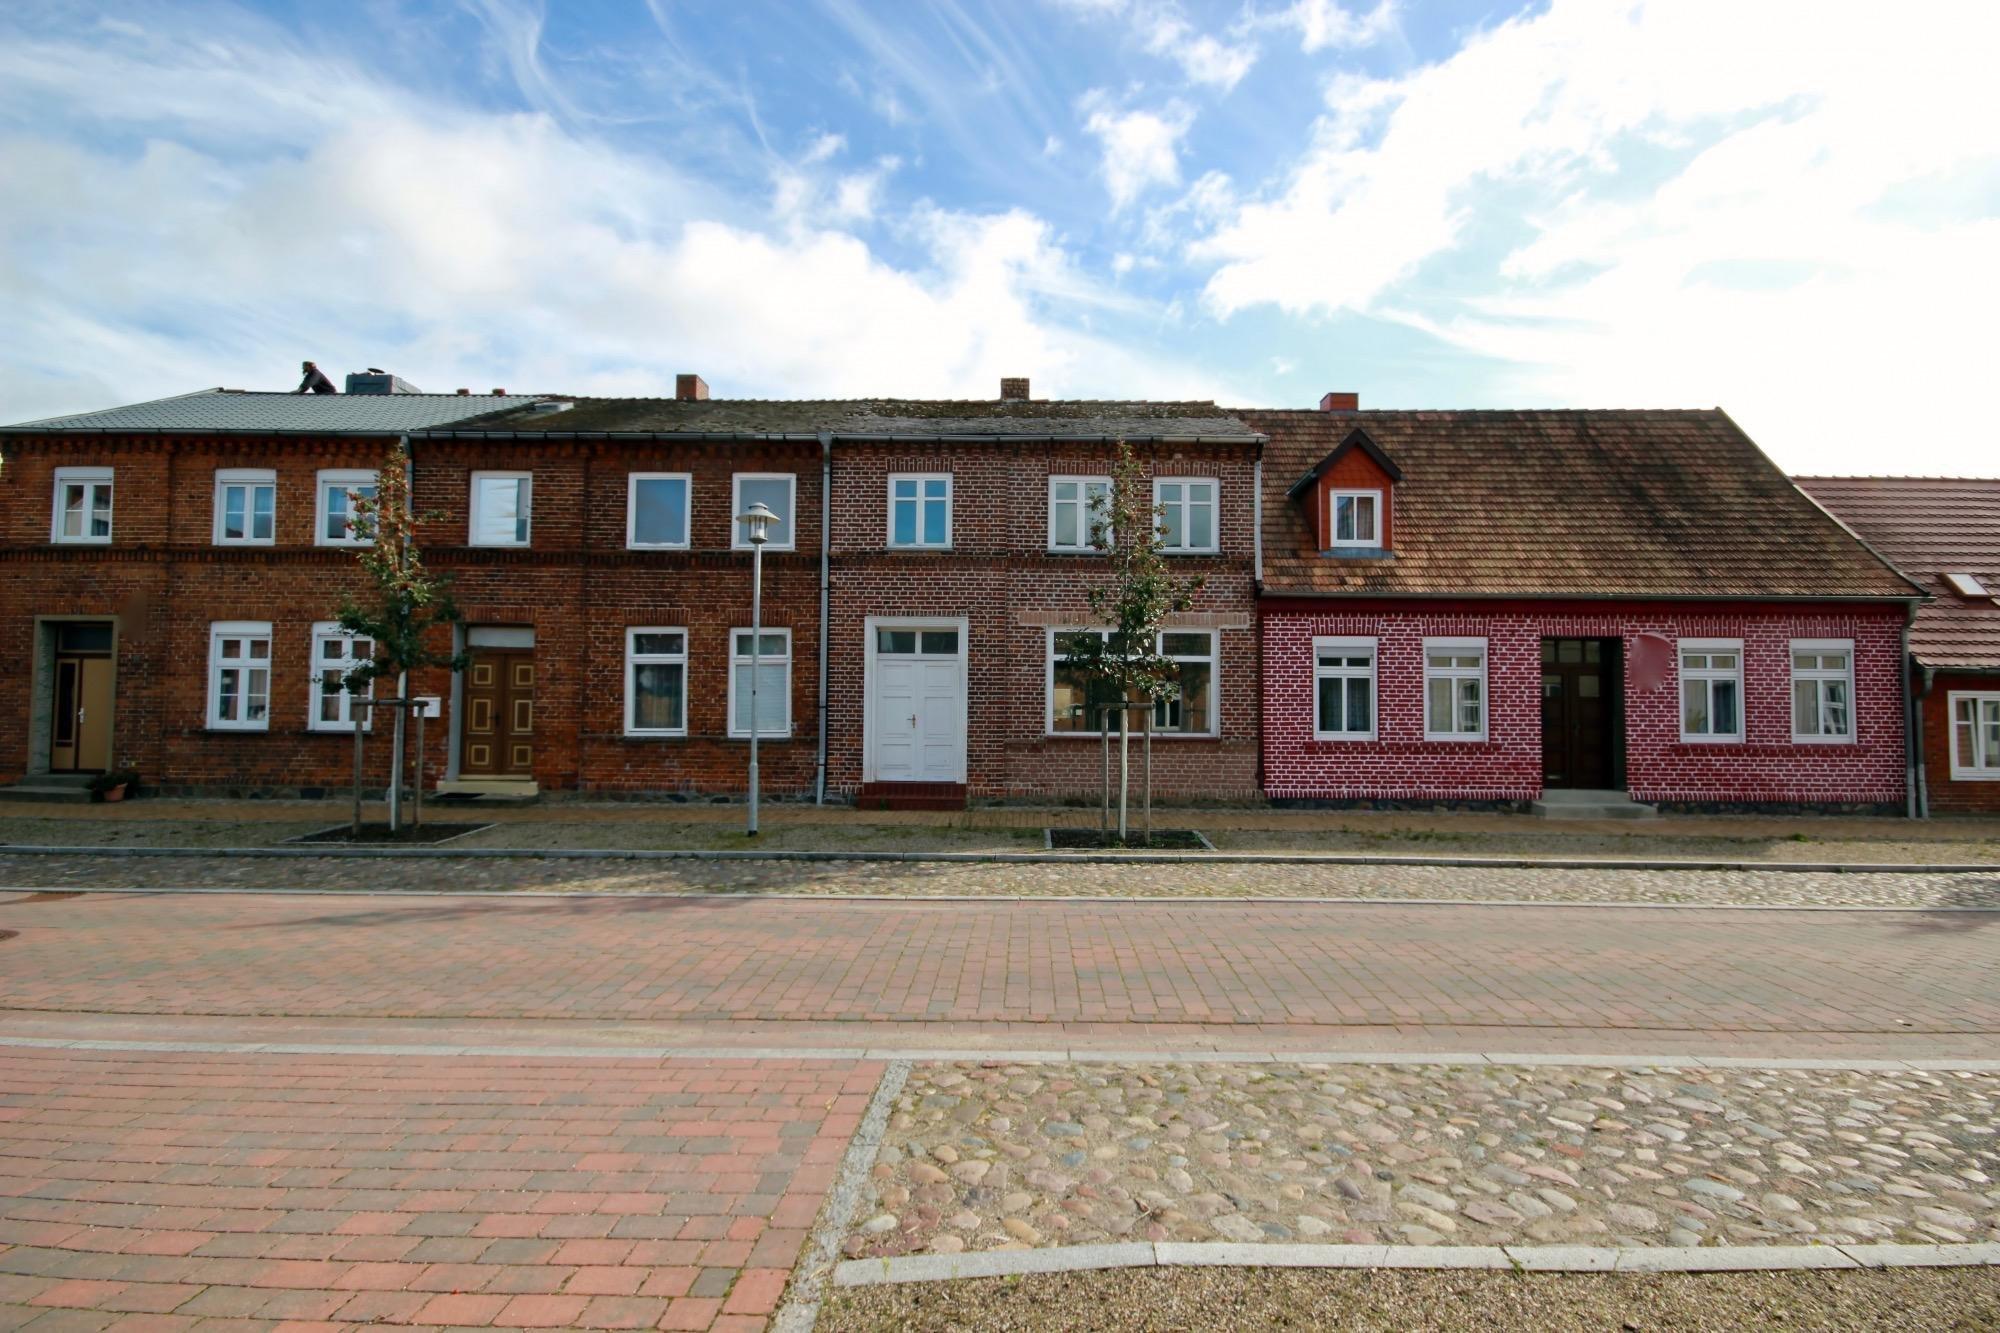 Stadthaus in Ludwigslust